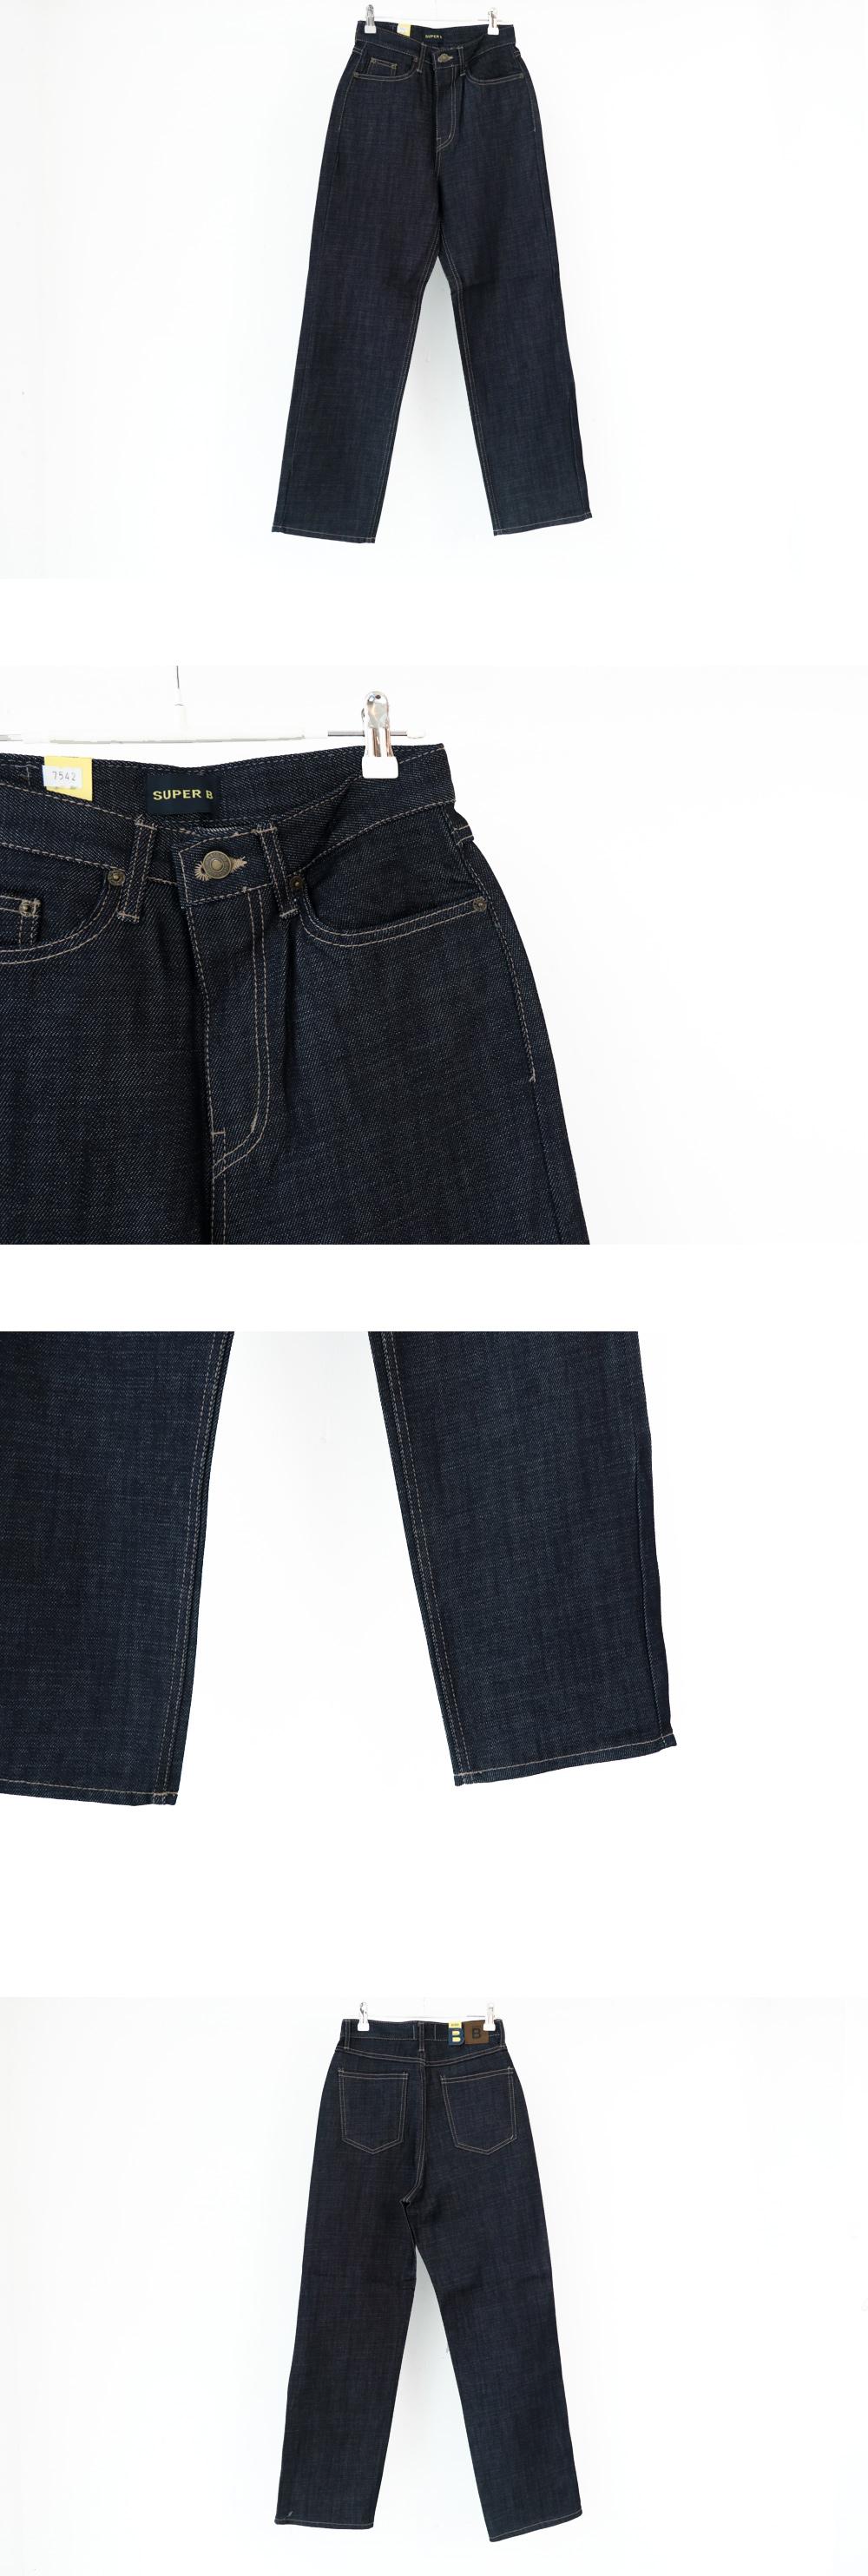 7542 high-waist straight wide denim pants